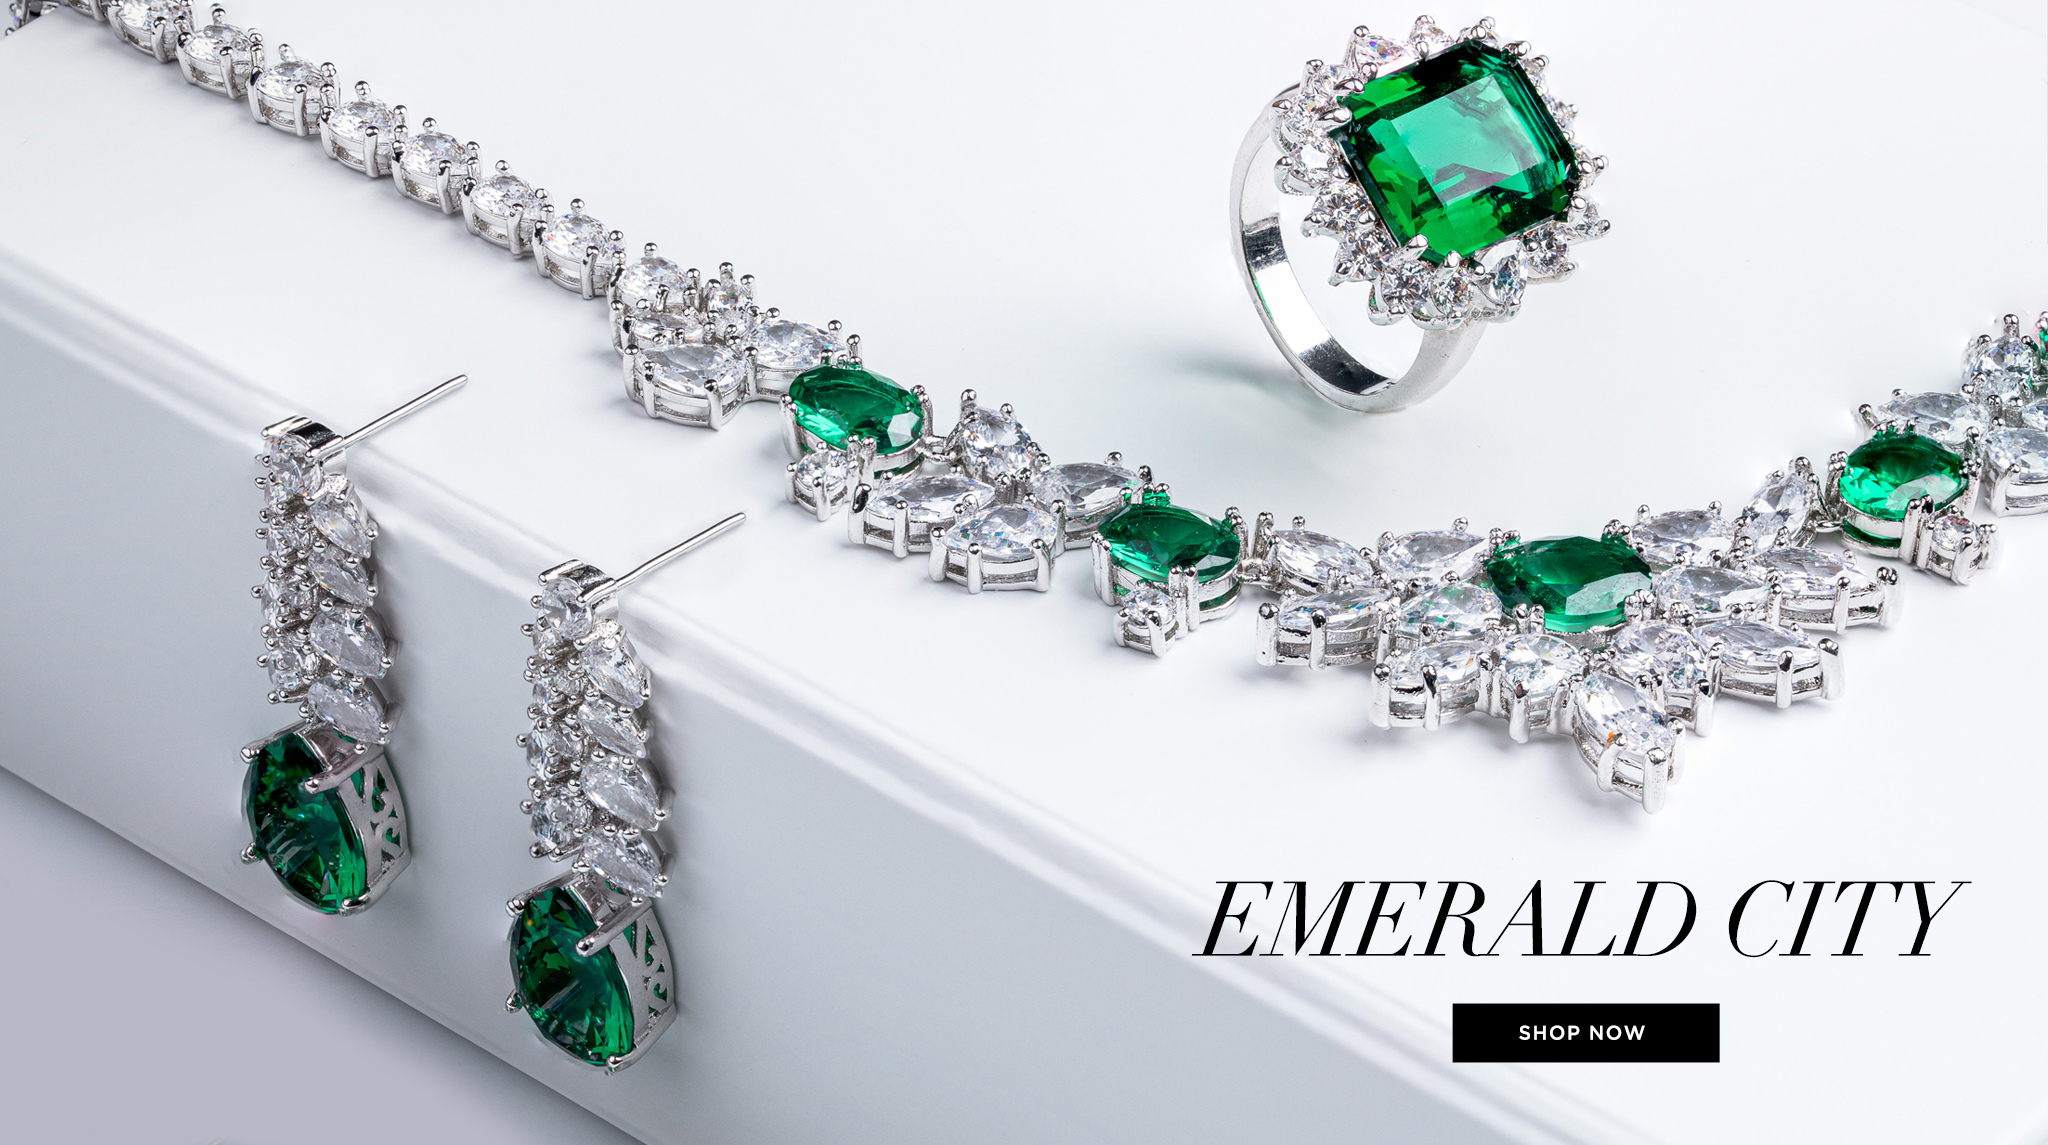 CZKJL_homepage_EmeraldCity.jpg